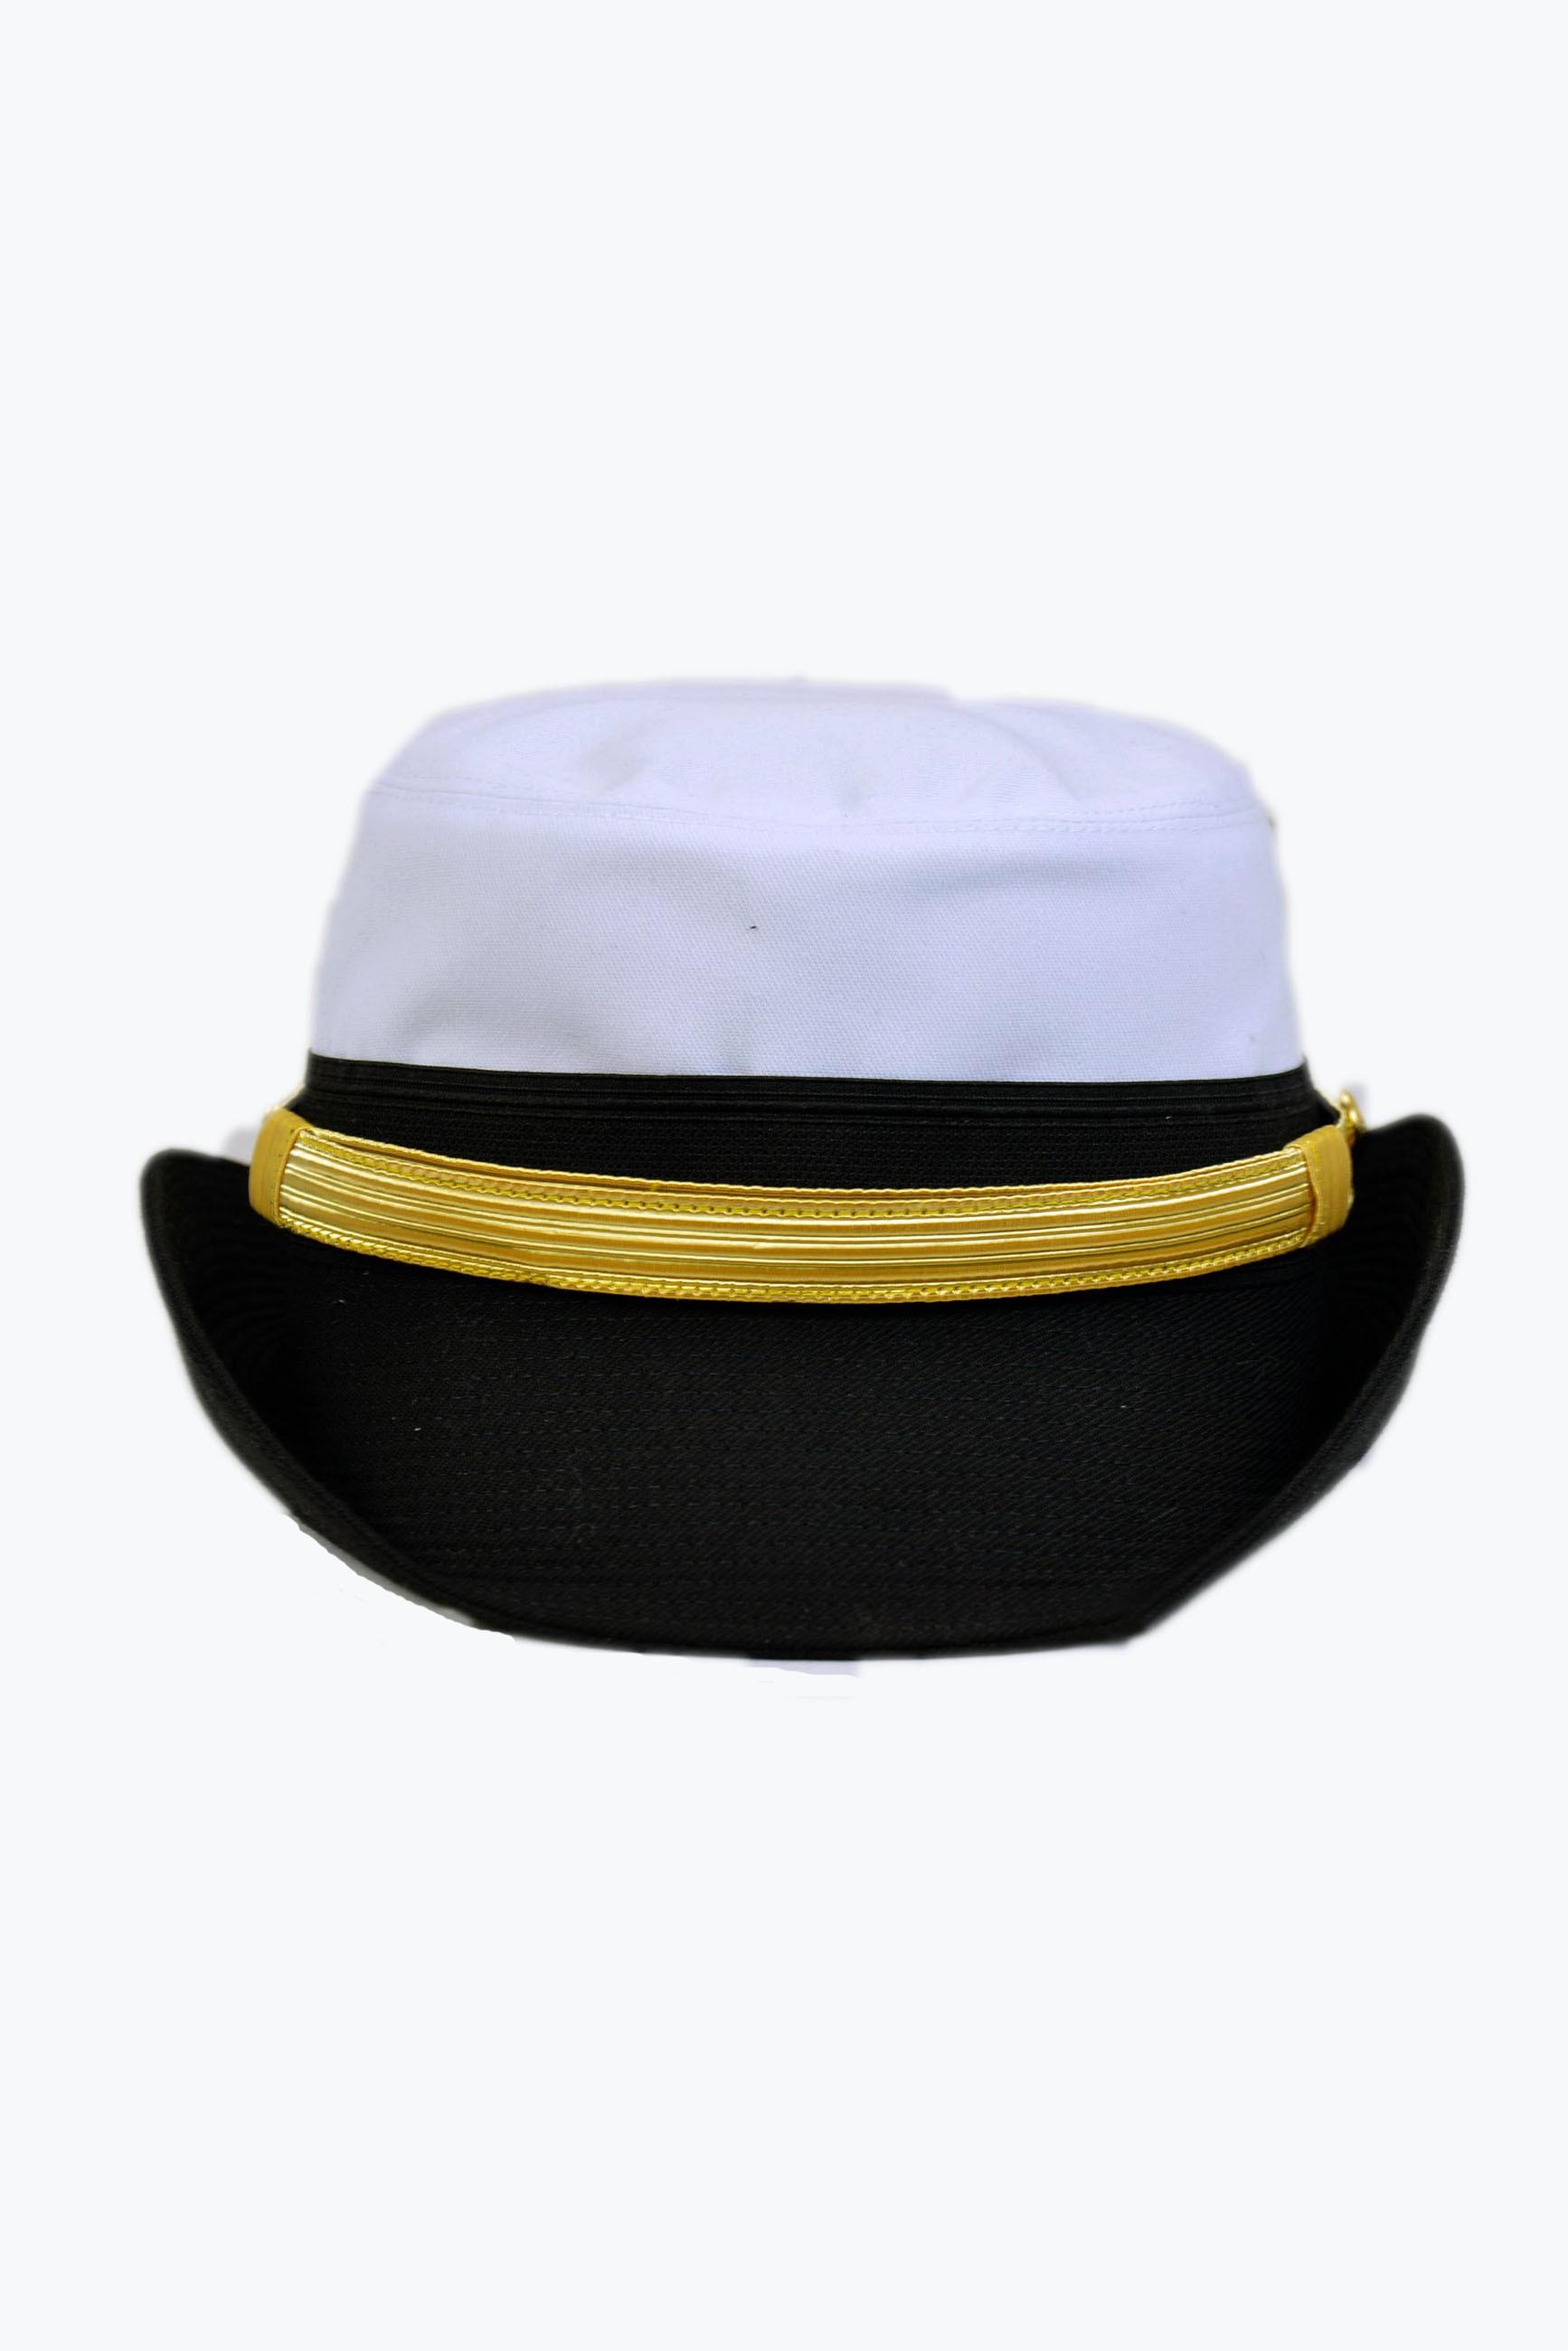 Gorra femenina Marina Mercante Española 16c198db0716